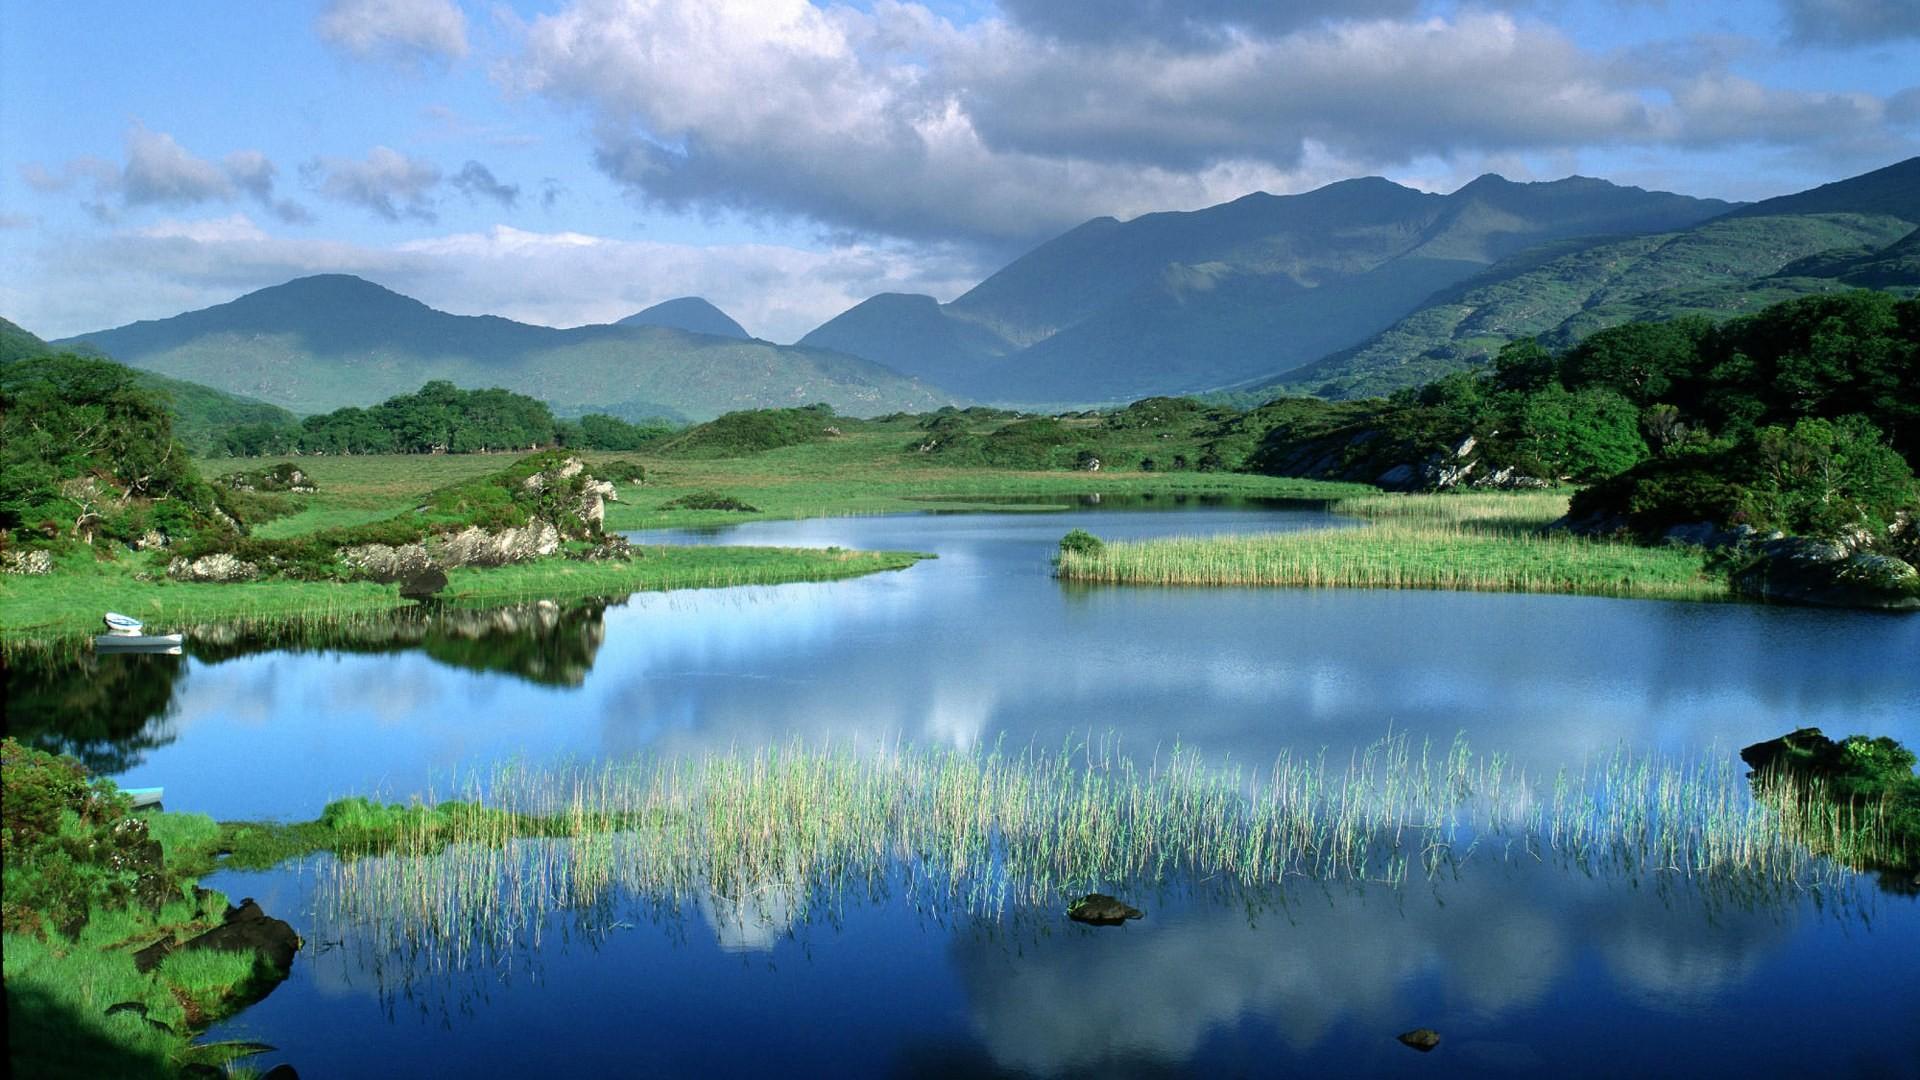 HD_beautiful_nature_landsacpe_FGHJ_43019 ·  Nature_Beautiful_Wallpaper_1920x1080_67